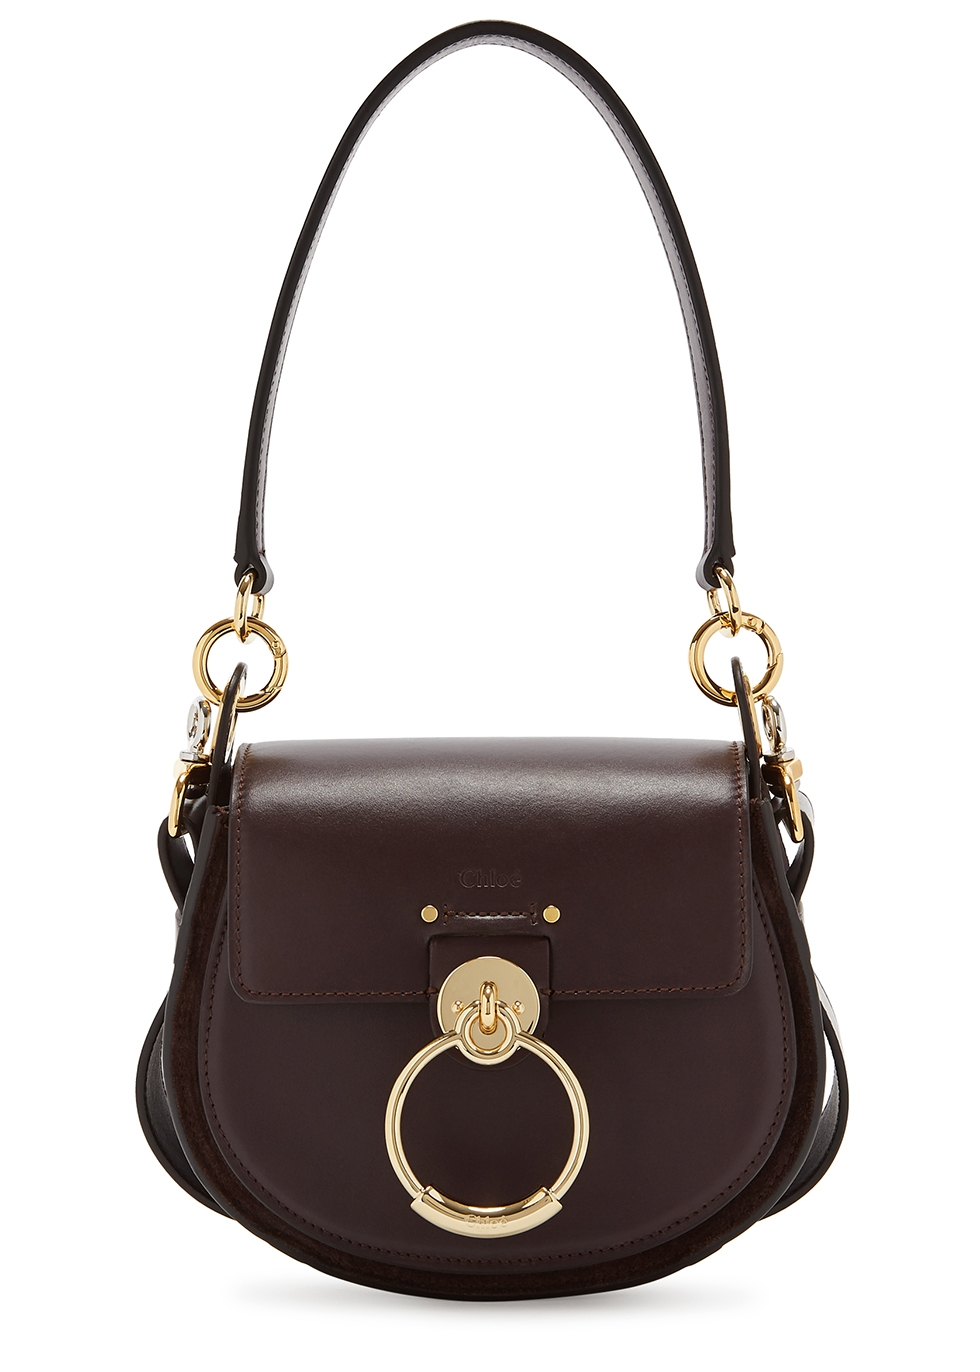 CHLOÉ | Chloé Tess Small Leather Shoulder Bag | Goxip